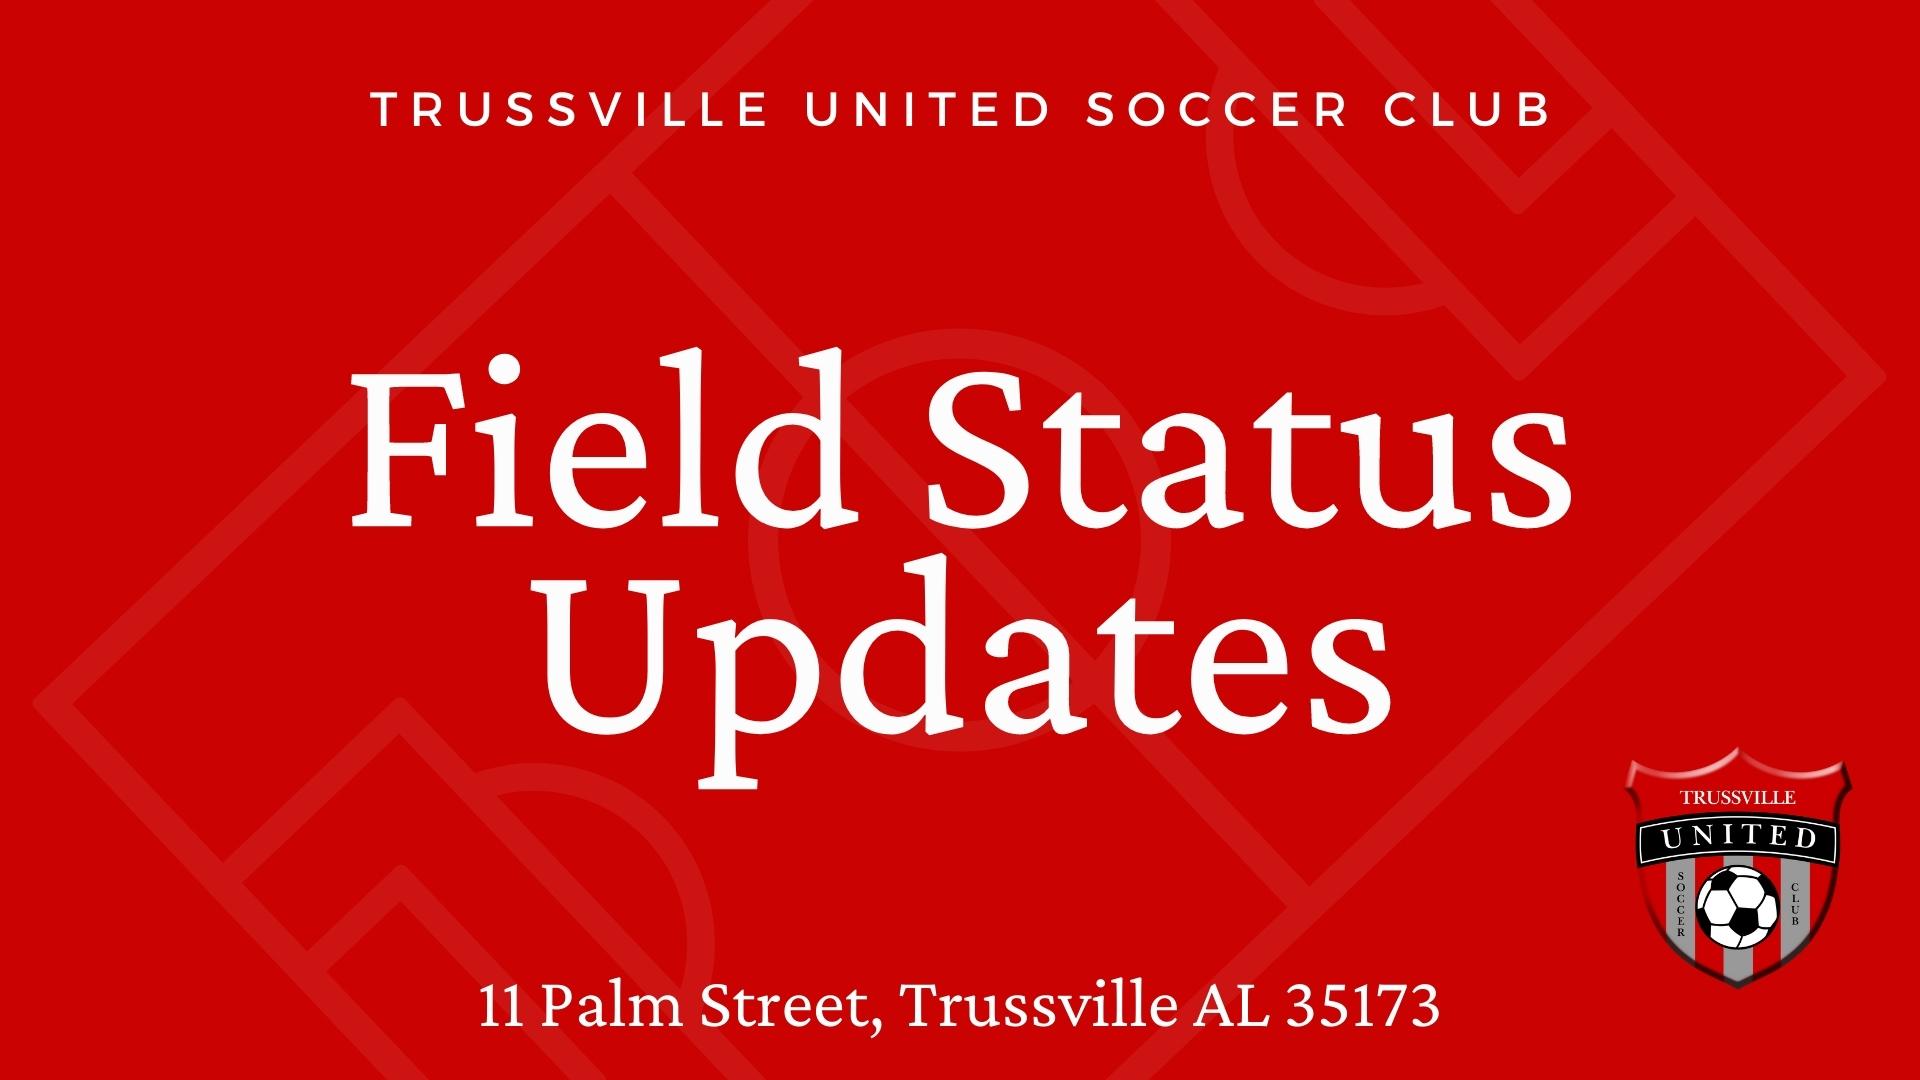 1920x1080 TUSC Field Status Updates